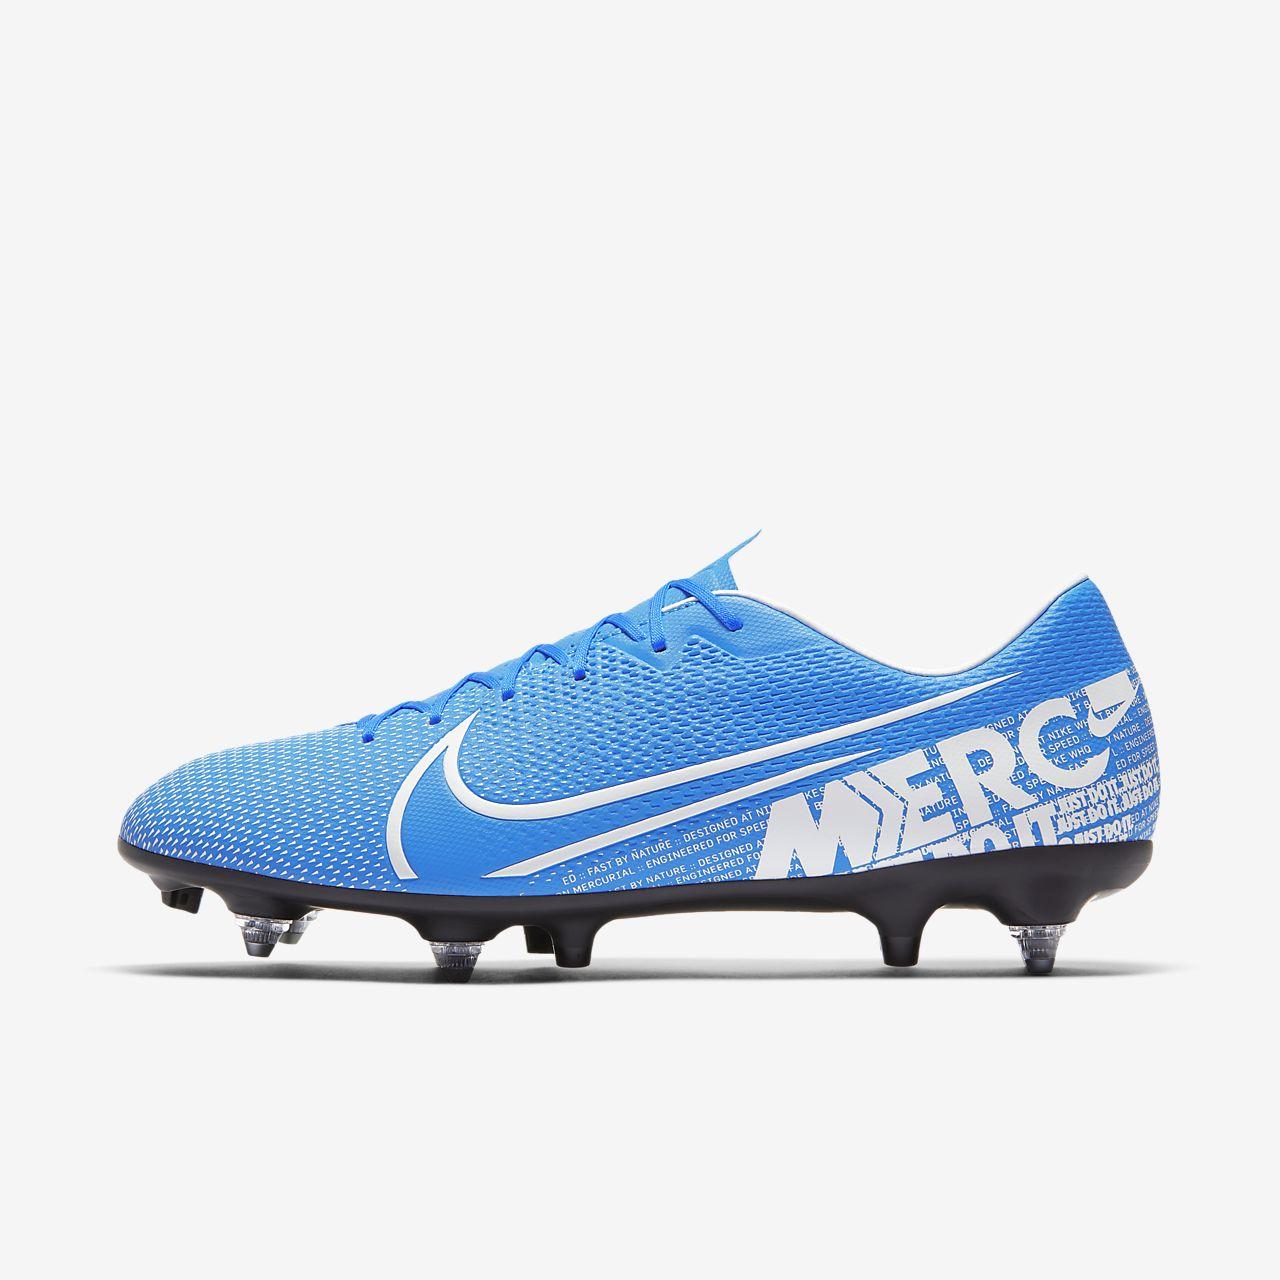 Nike Mercurial Vapor 13 Academy SG-PRO Anti-Clog Traction Voetbalschoen (zachte ondergrond)